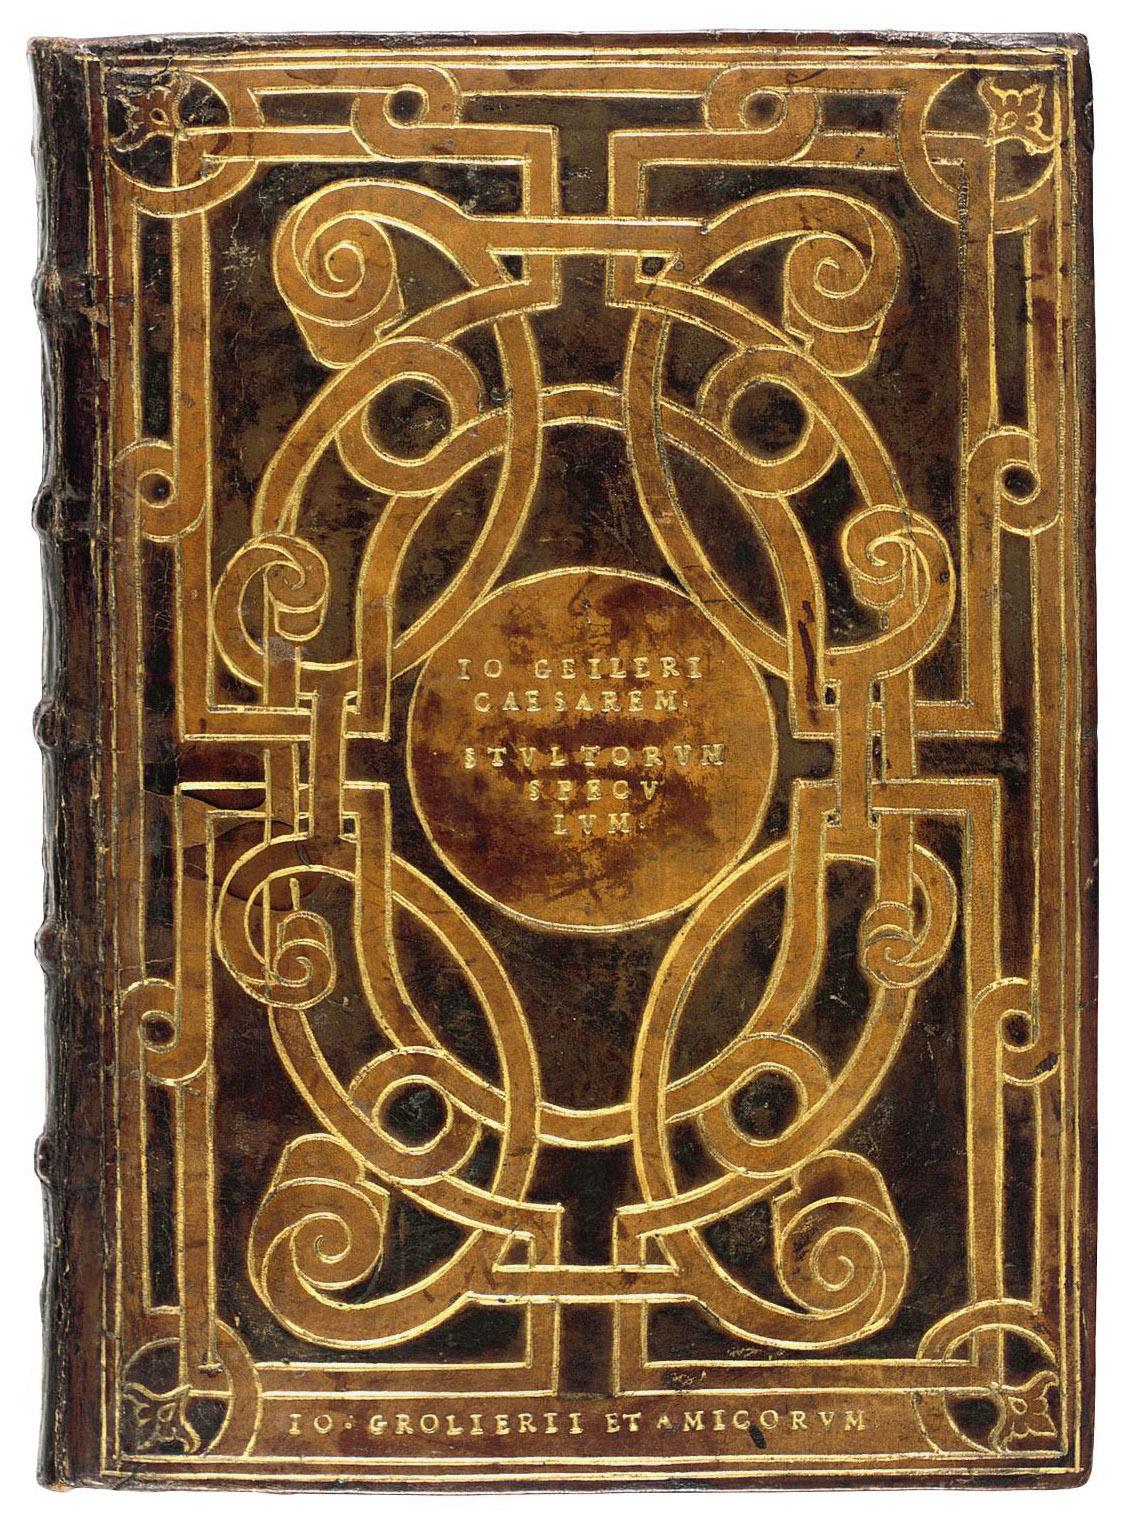 GEILER VON KAISERSBERG (1445-1510). Navicula, sive Speculum fatuorum. Edited by Jacob Otther. Strassburg: Johann Prüss, 16 January 1511.